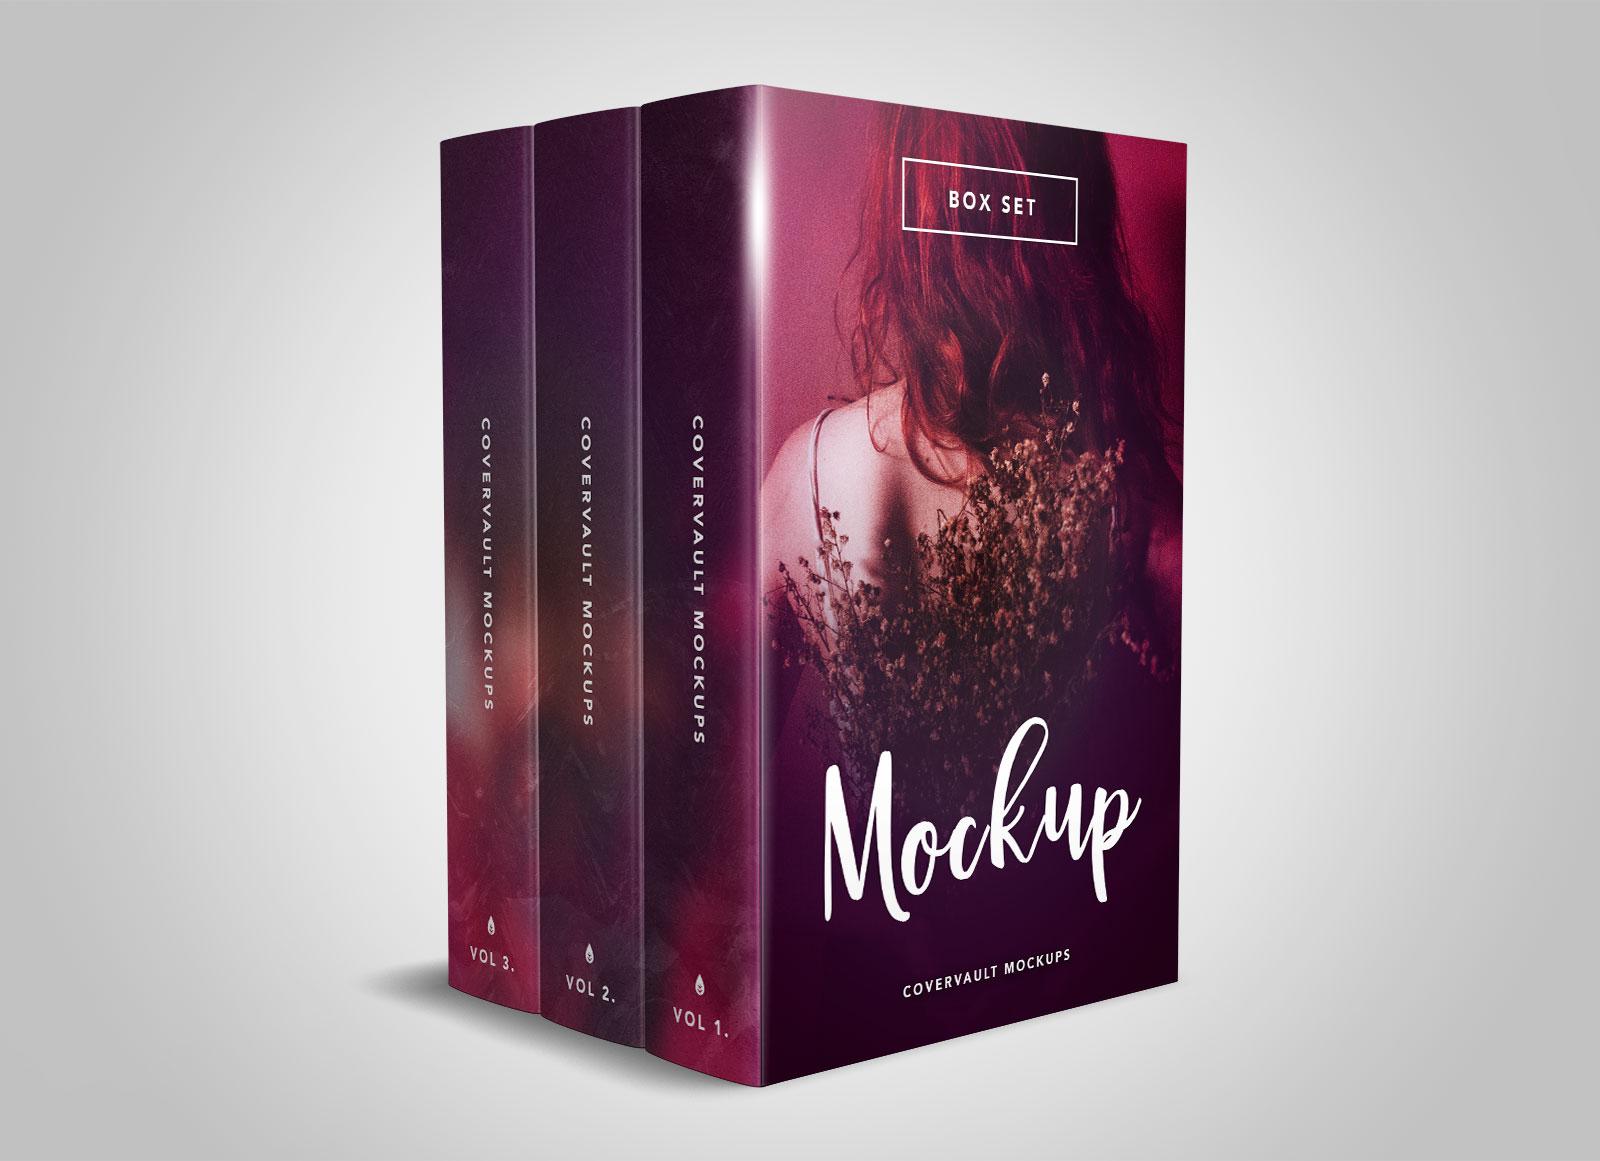 Free-3-Books-Set-PSD-Mockup-Template-2